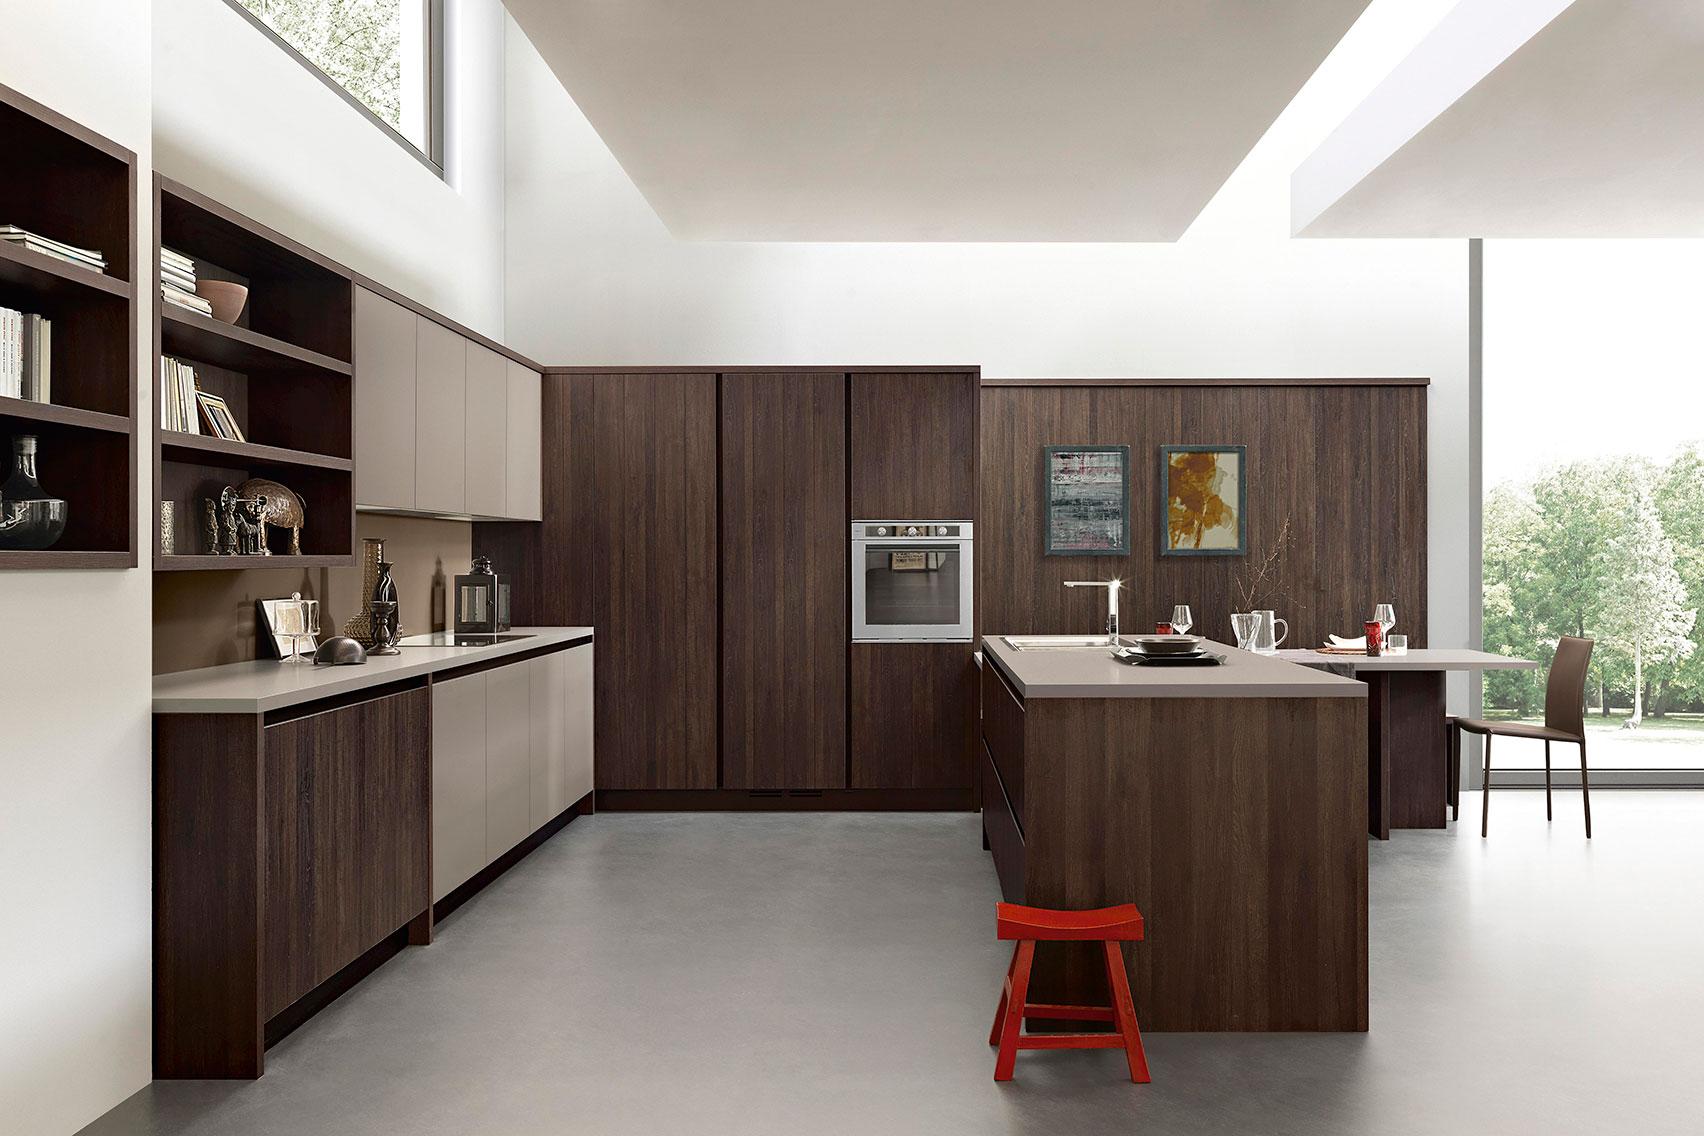 La madera en cocina for Fotos cocinas modernas 2016